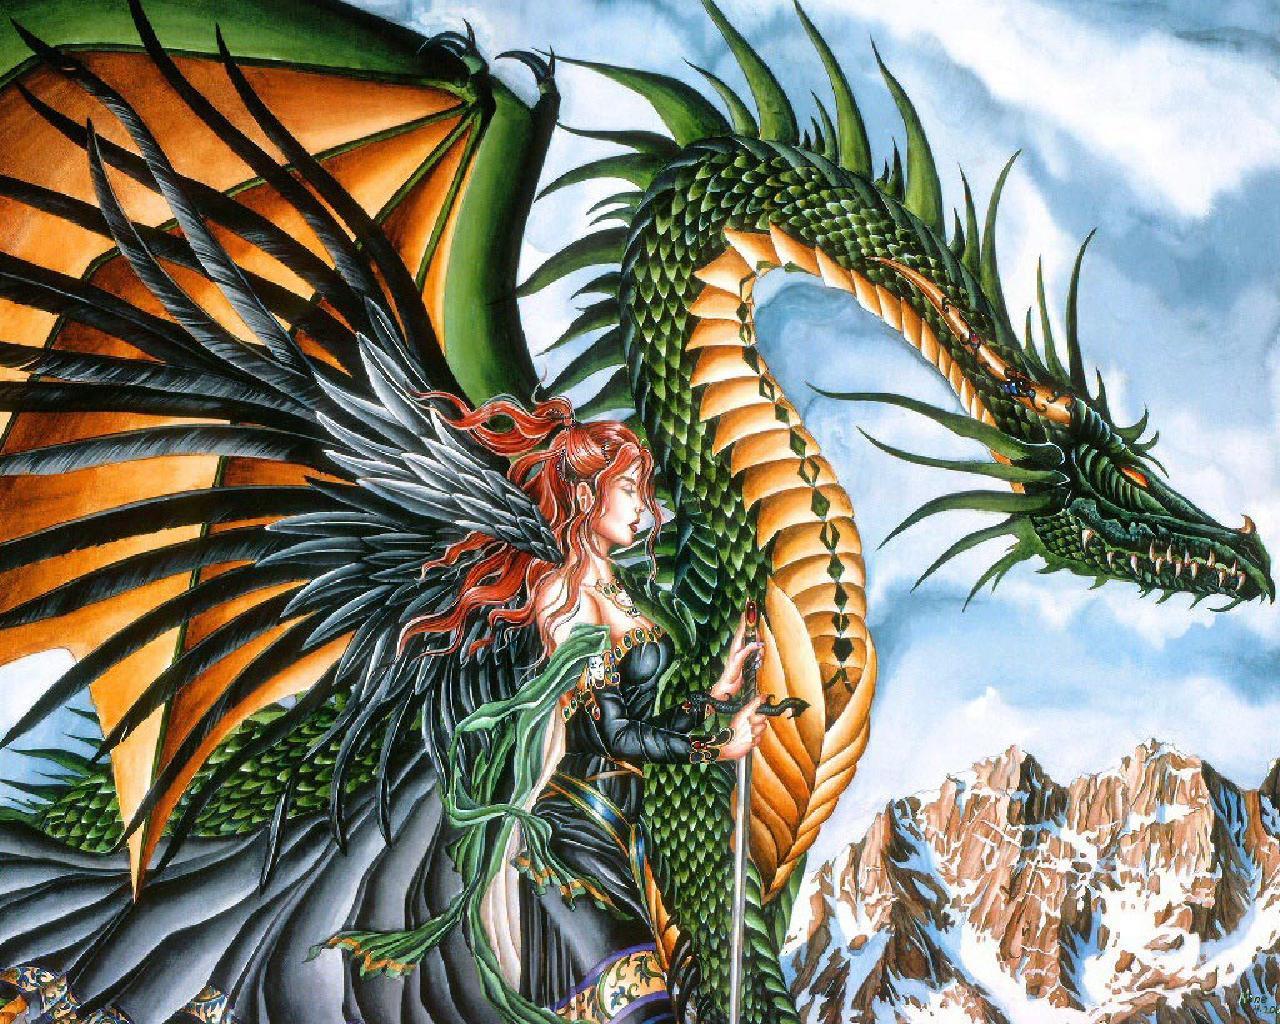 Dragon Wallpapers and Screensavers 1280x1024